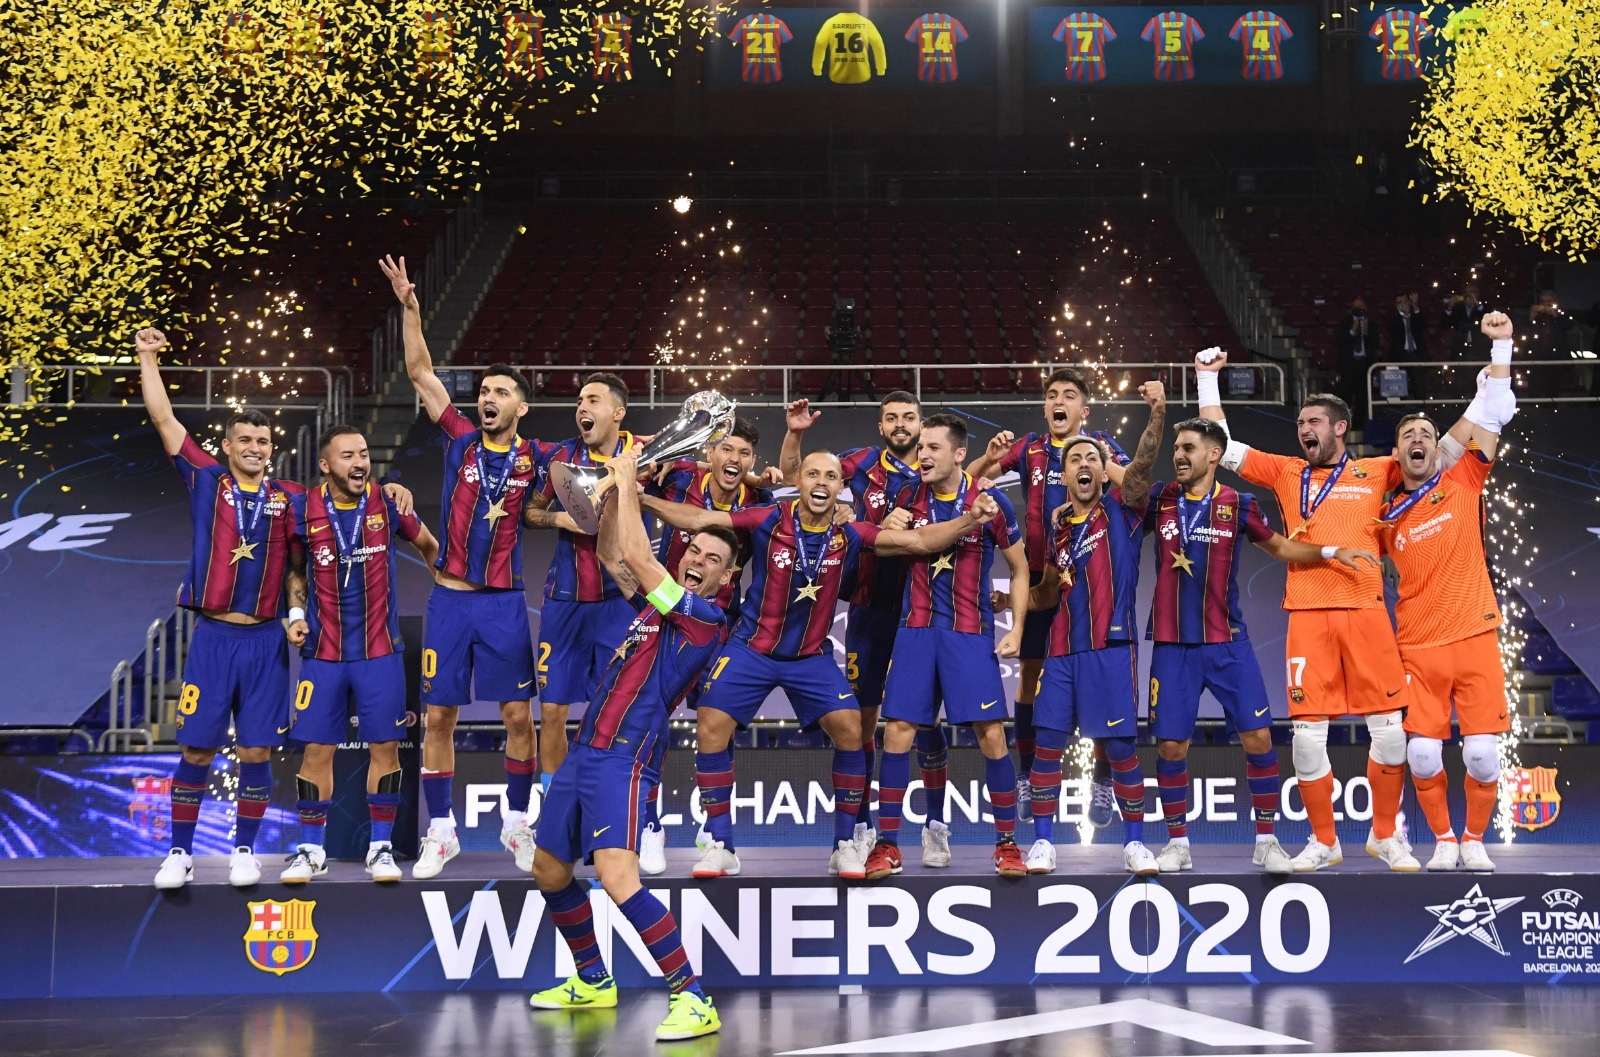 ¡CAMPEONES! Πρωταθλήτρια Ευρώπης η Barça!